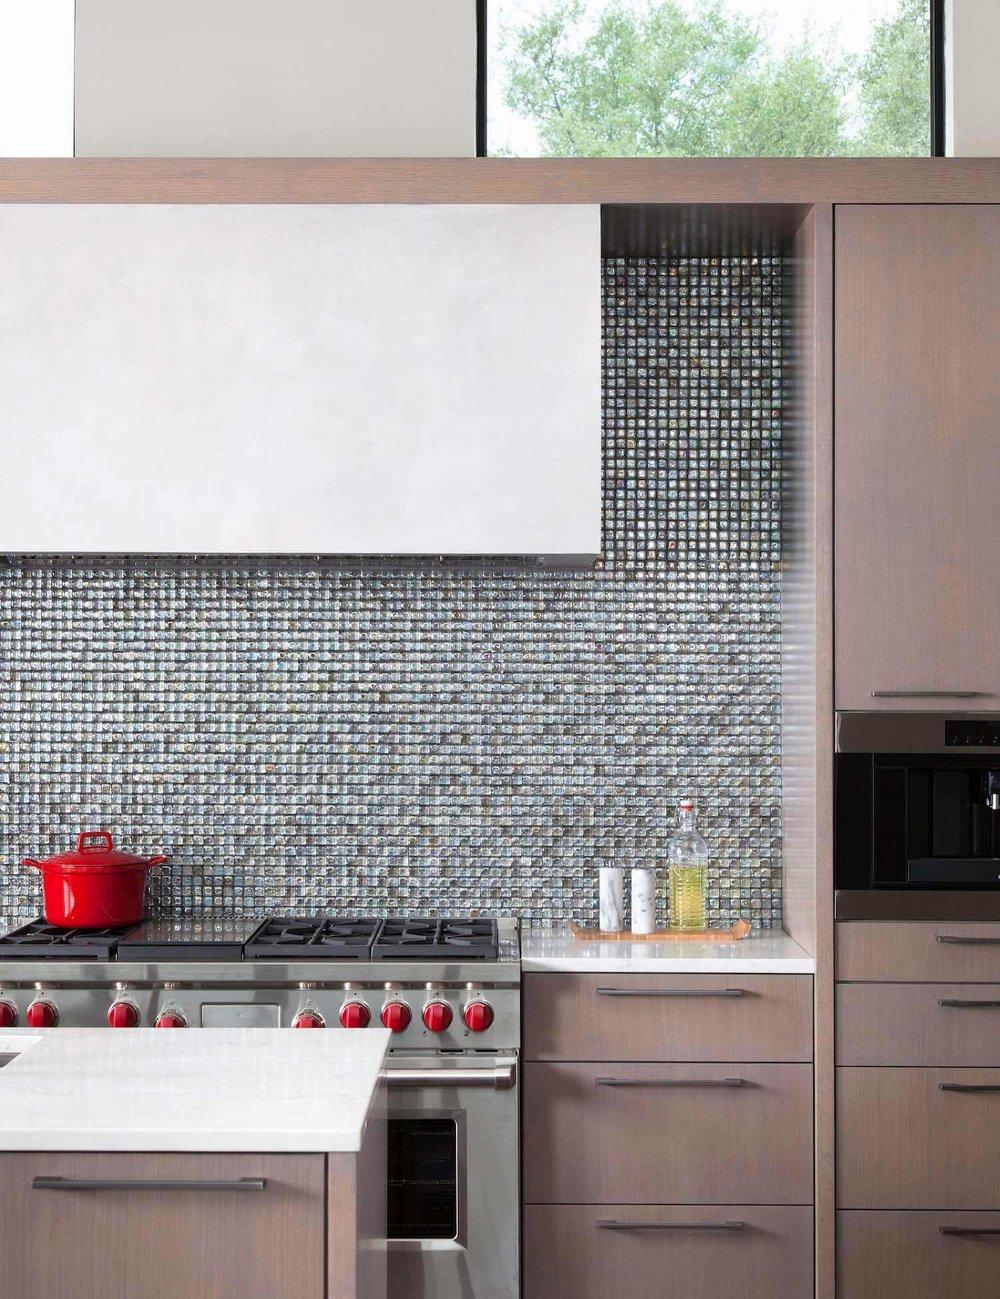 Horseshoe Bay Kitchen Detail | Robin Colton Interior Design Studio Austin Texas | www.robincolton.com